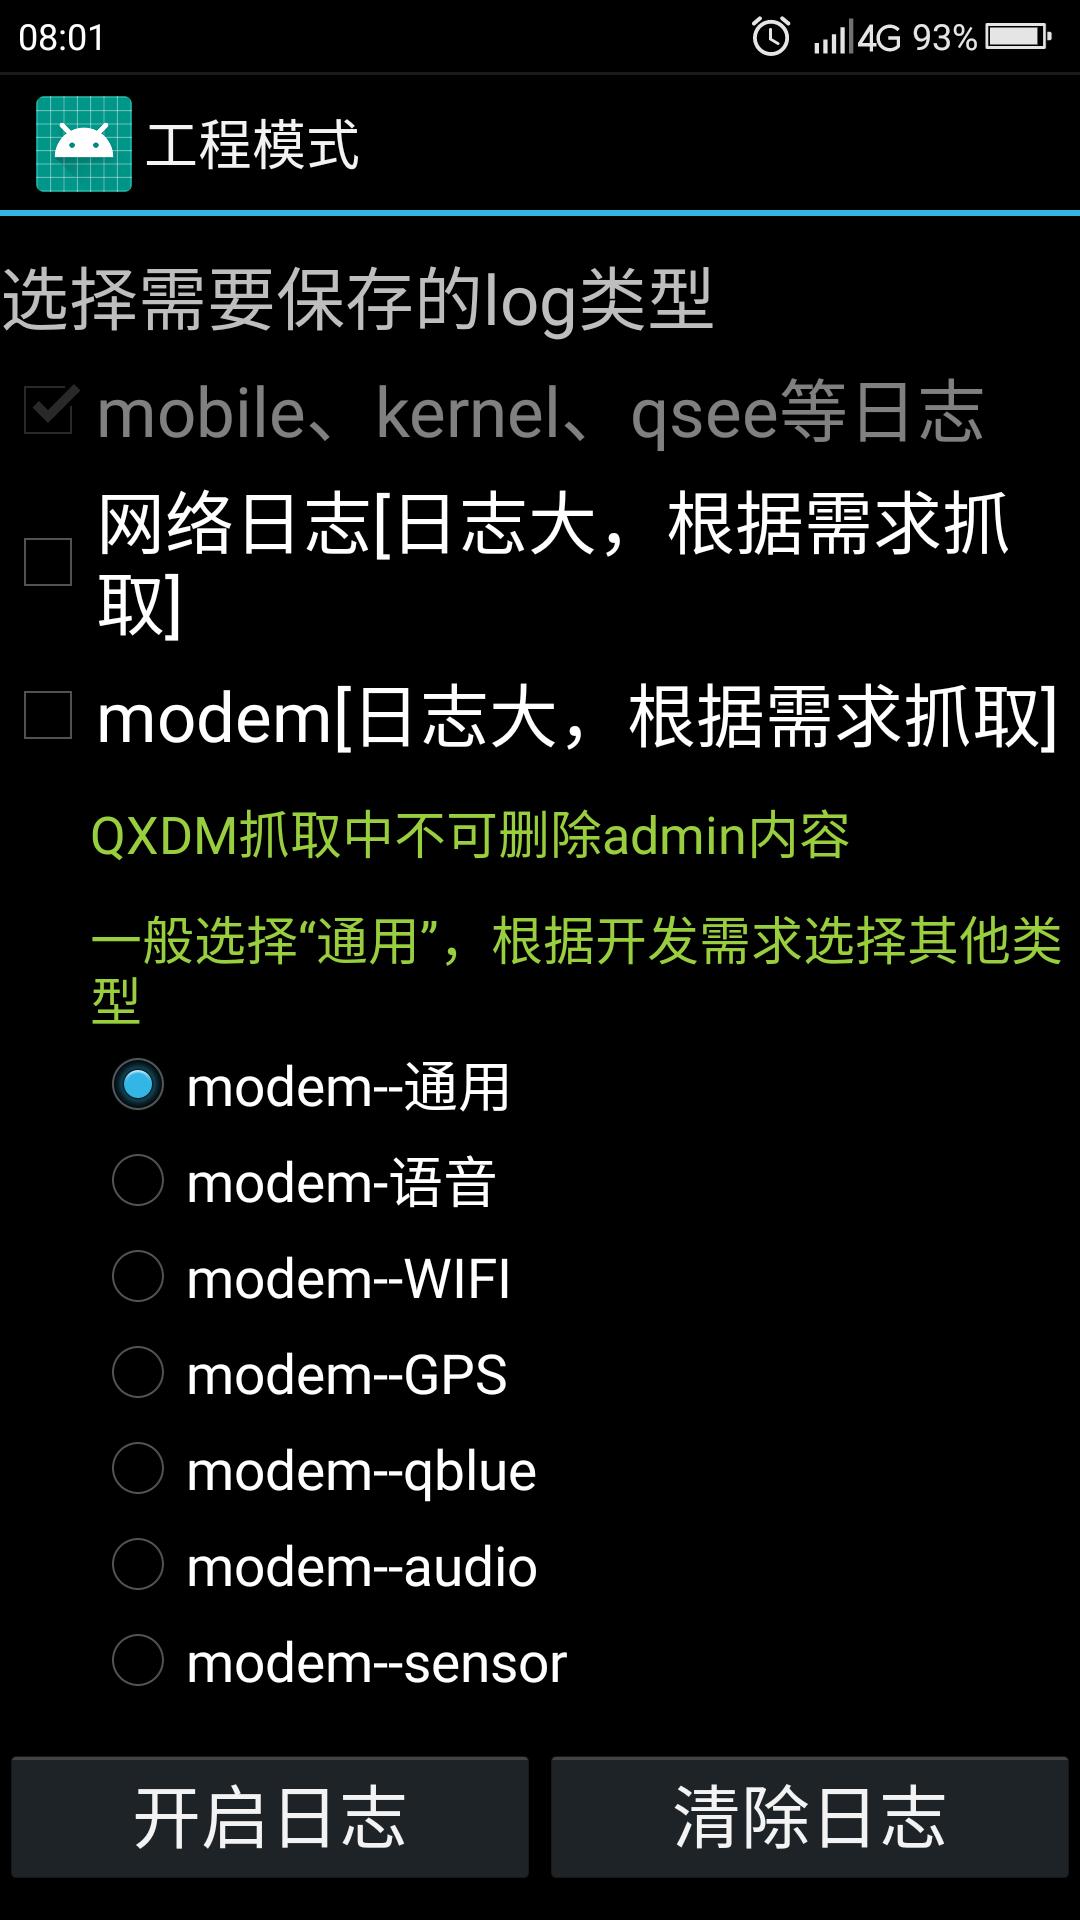 Screenshot_2021-04-19-08-01-53.png